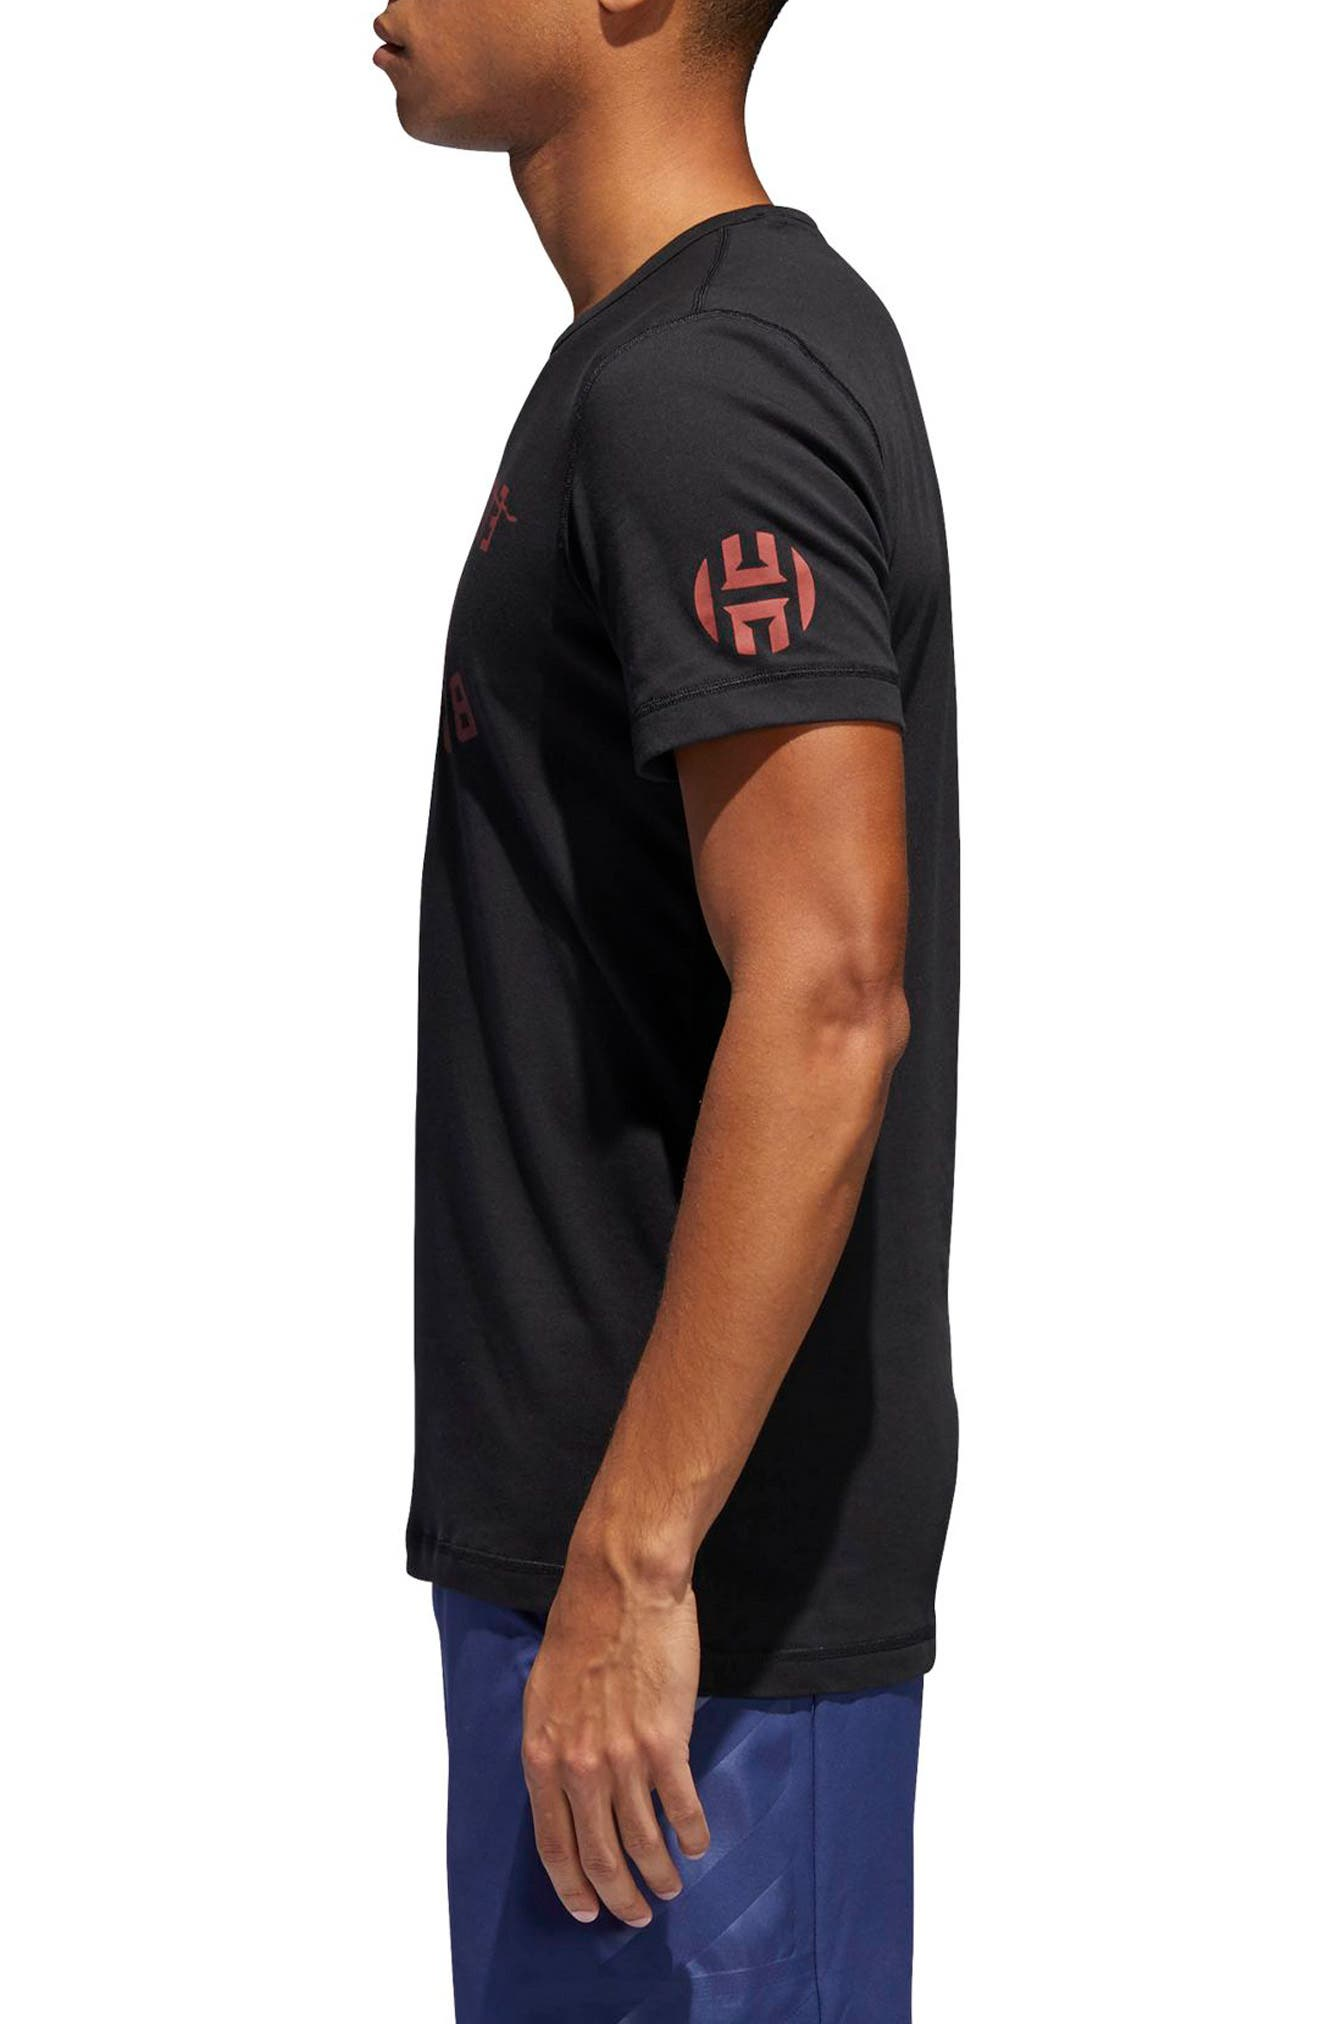 Harden Brand Slogan T-Shirt,                             Alternate thumbnail 3, color,                             Black